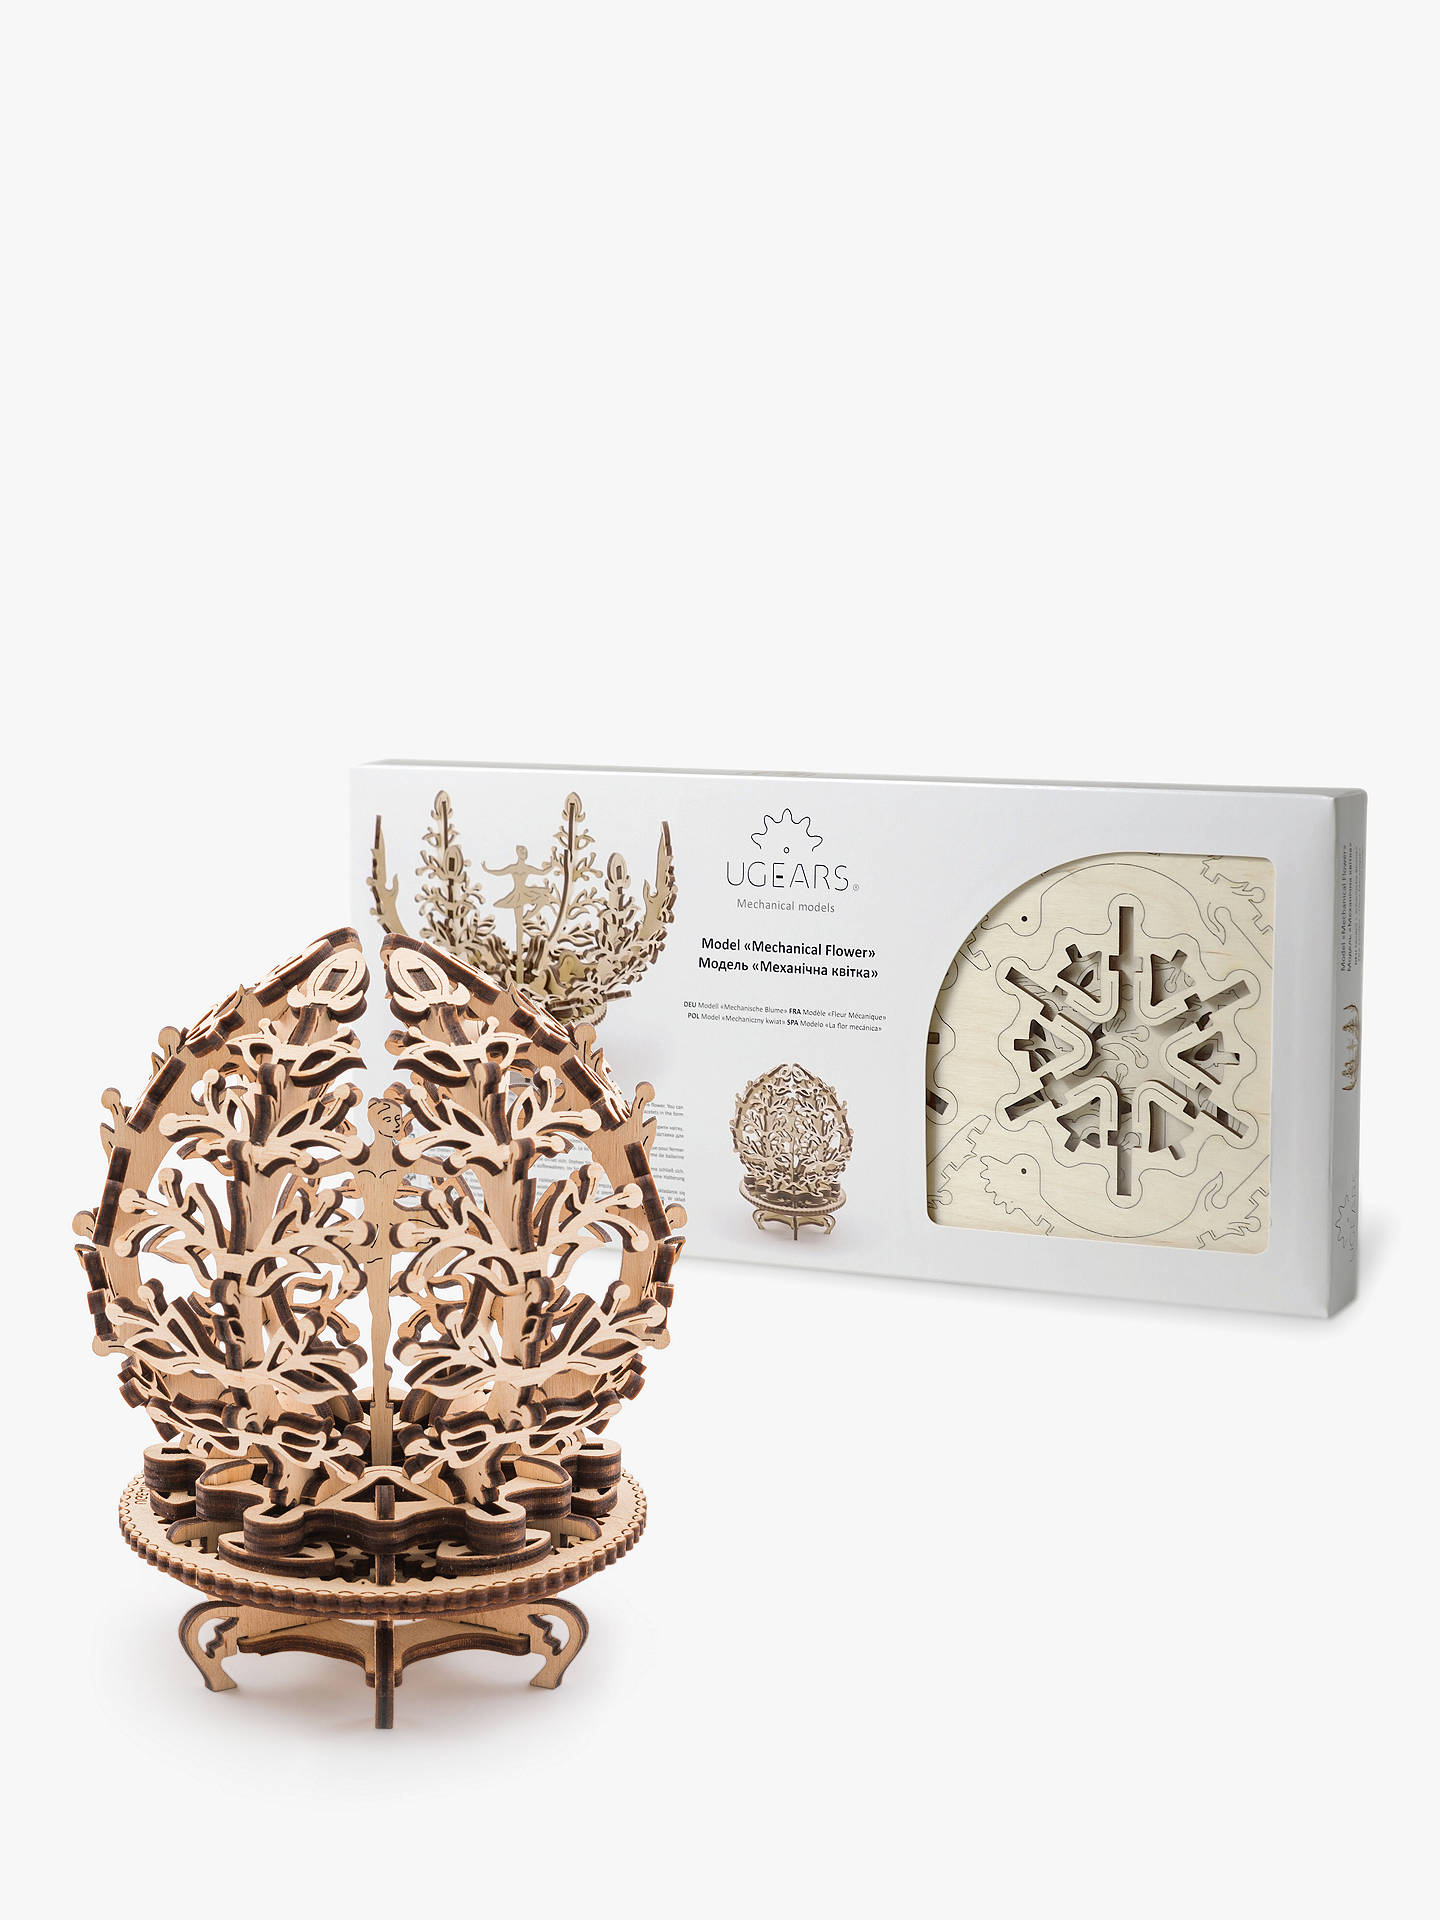 UGears Mechanical Flower 3D Puzzle Kit